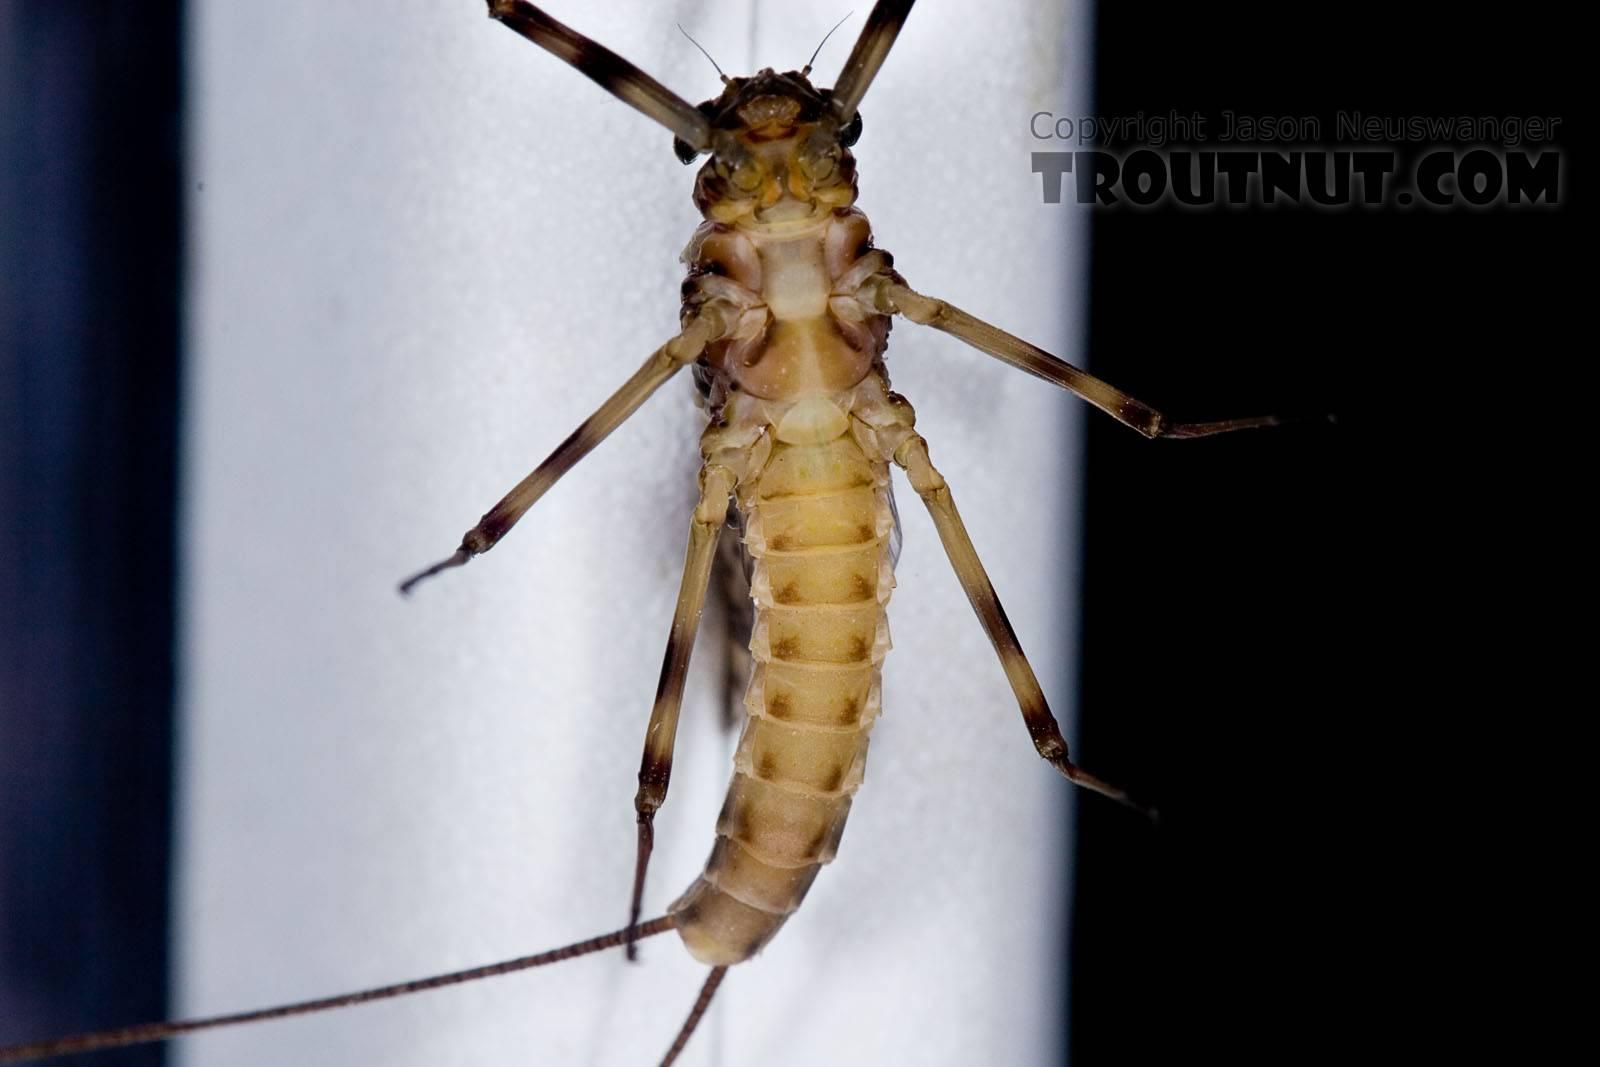 Female Maccaffertium vicarium (March Brown) Mayfly Dun from the Neversink River in New York